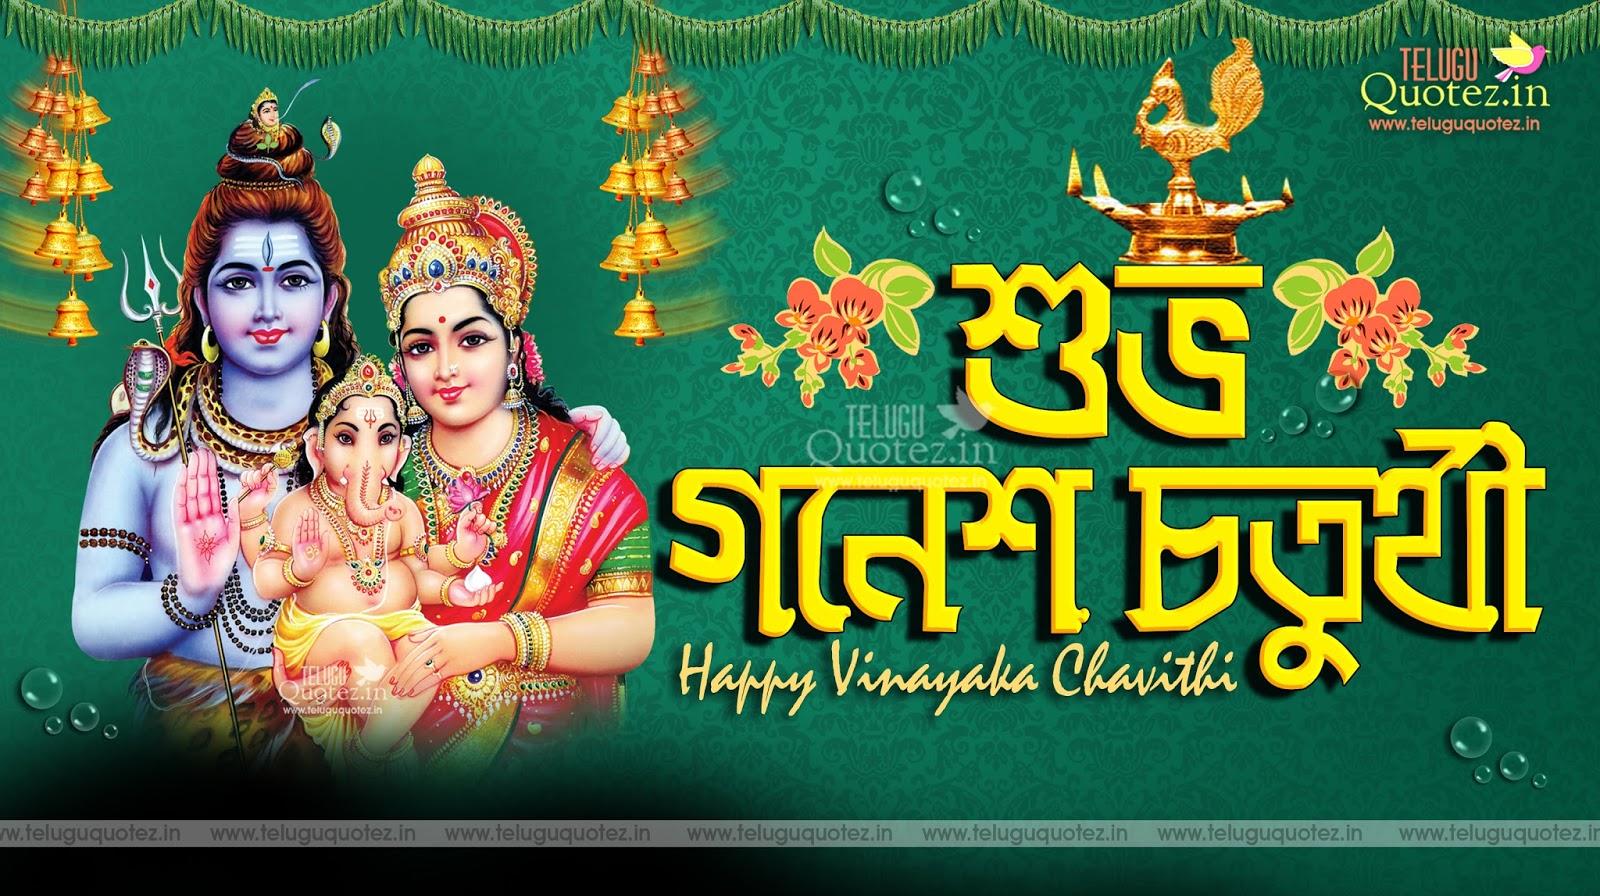 Vinayaka chaturthi bengali greetings and quotes All Top Quotes